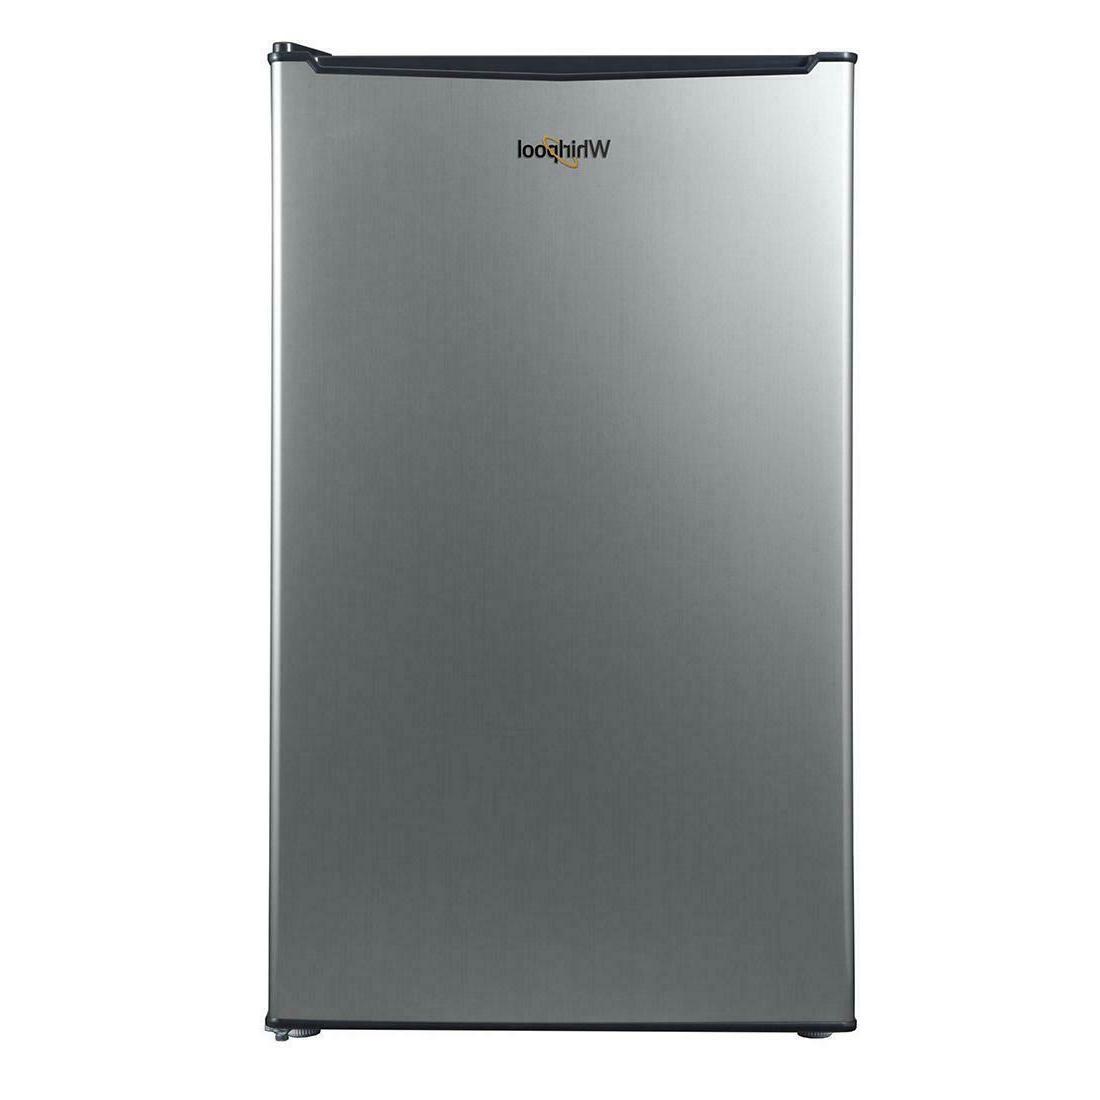 Whirlpool Compact Freezer Refrigerator